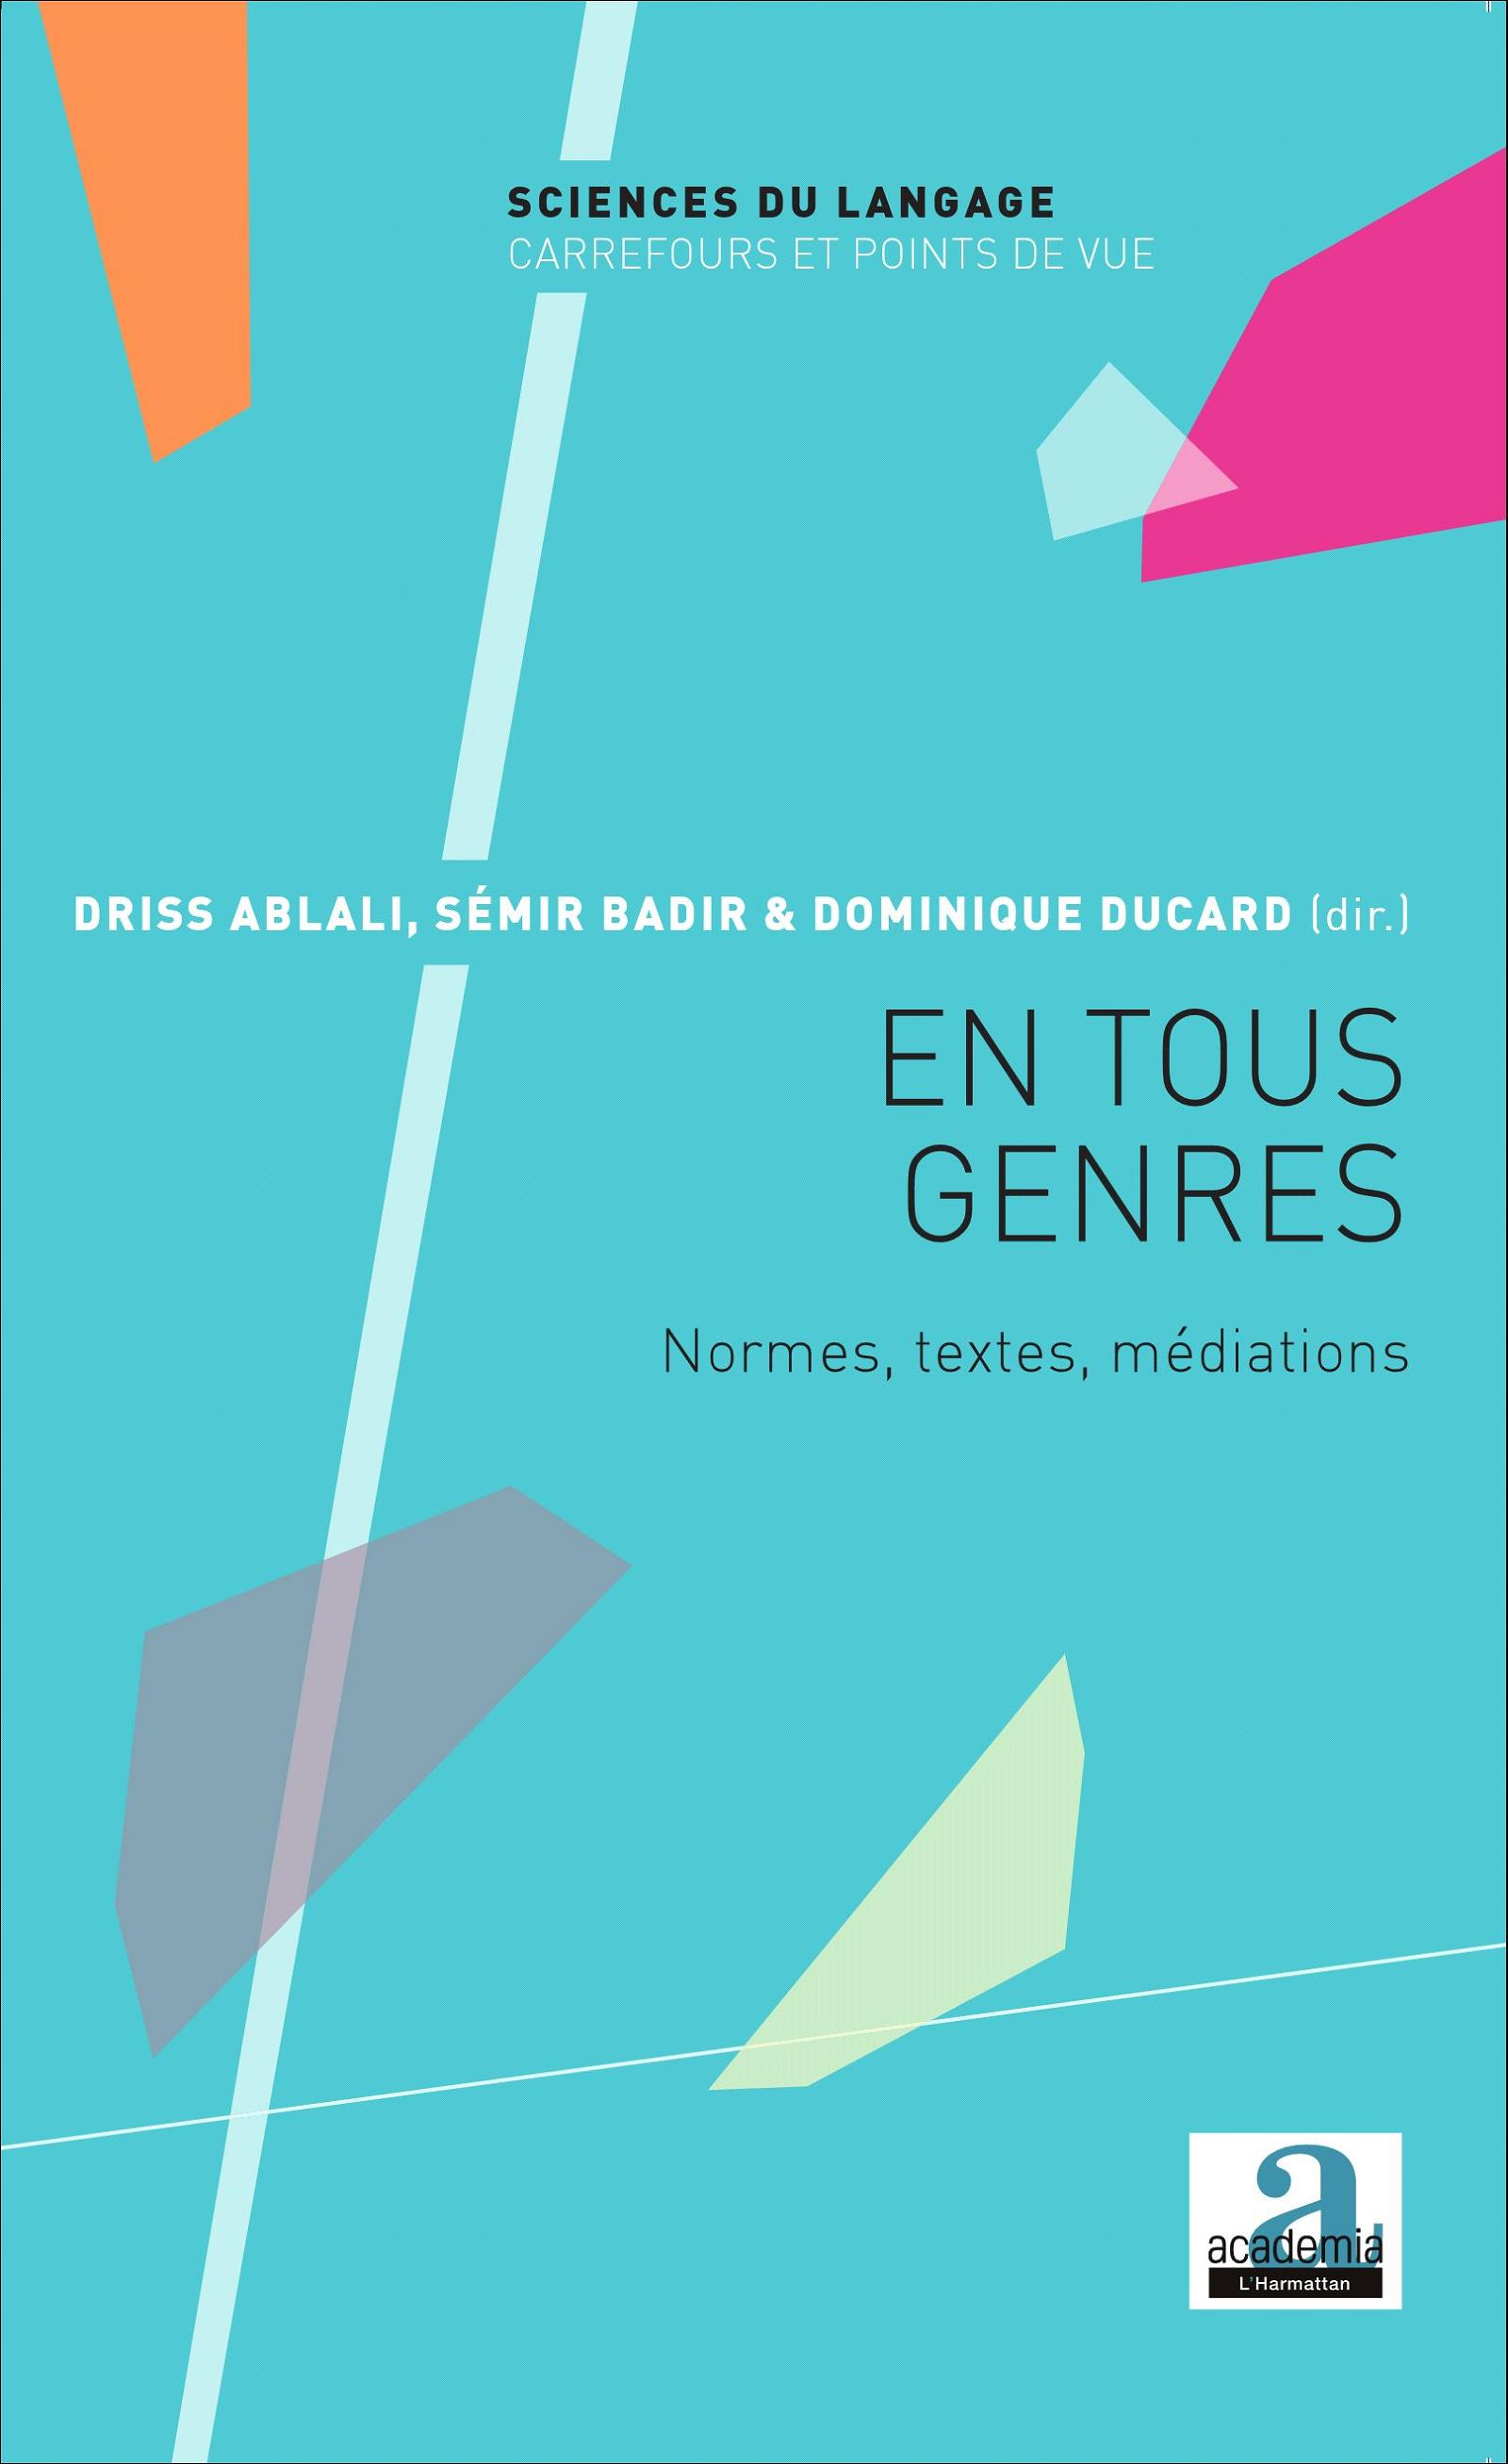 D. Ablali, S. Badir, D. Ducard (dir.), En tous genres